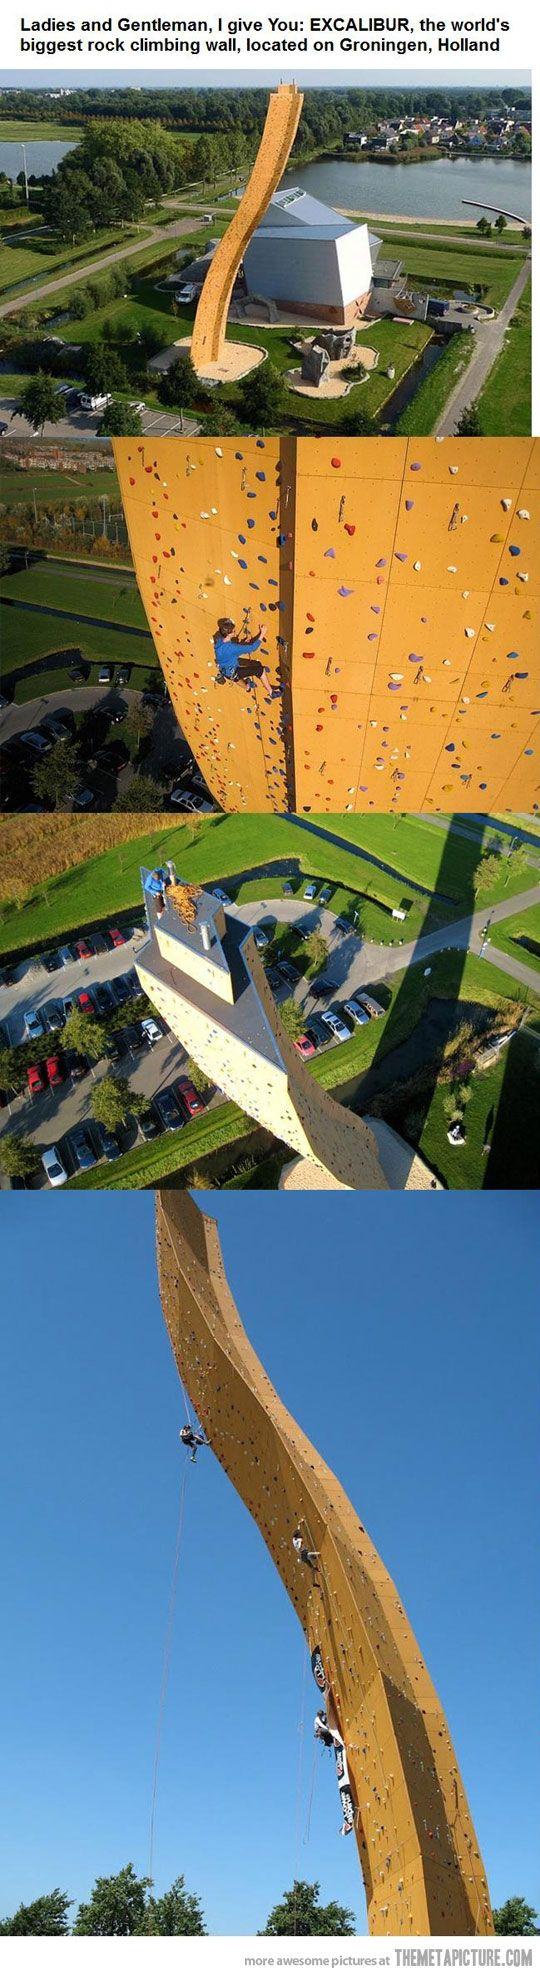 The world's biggest climbing wall